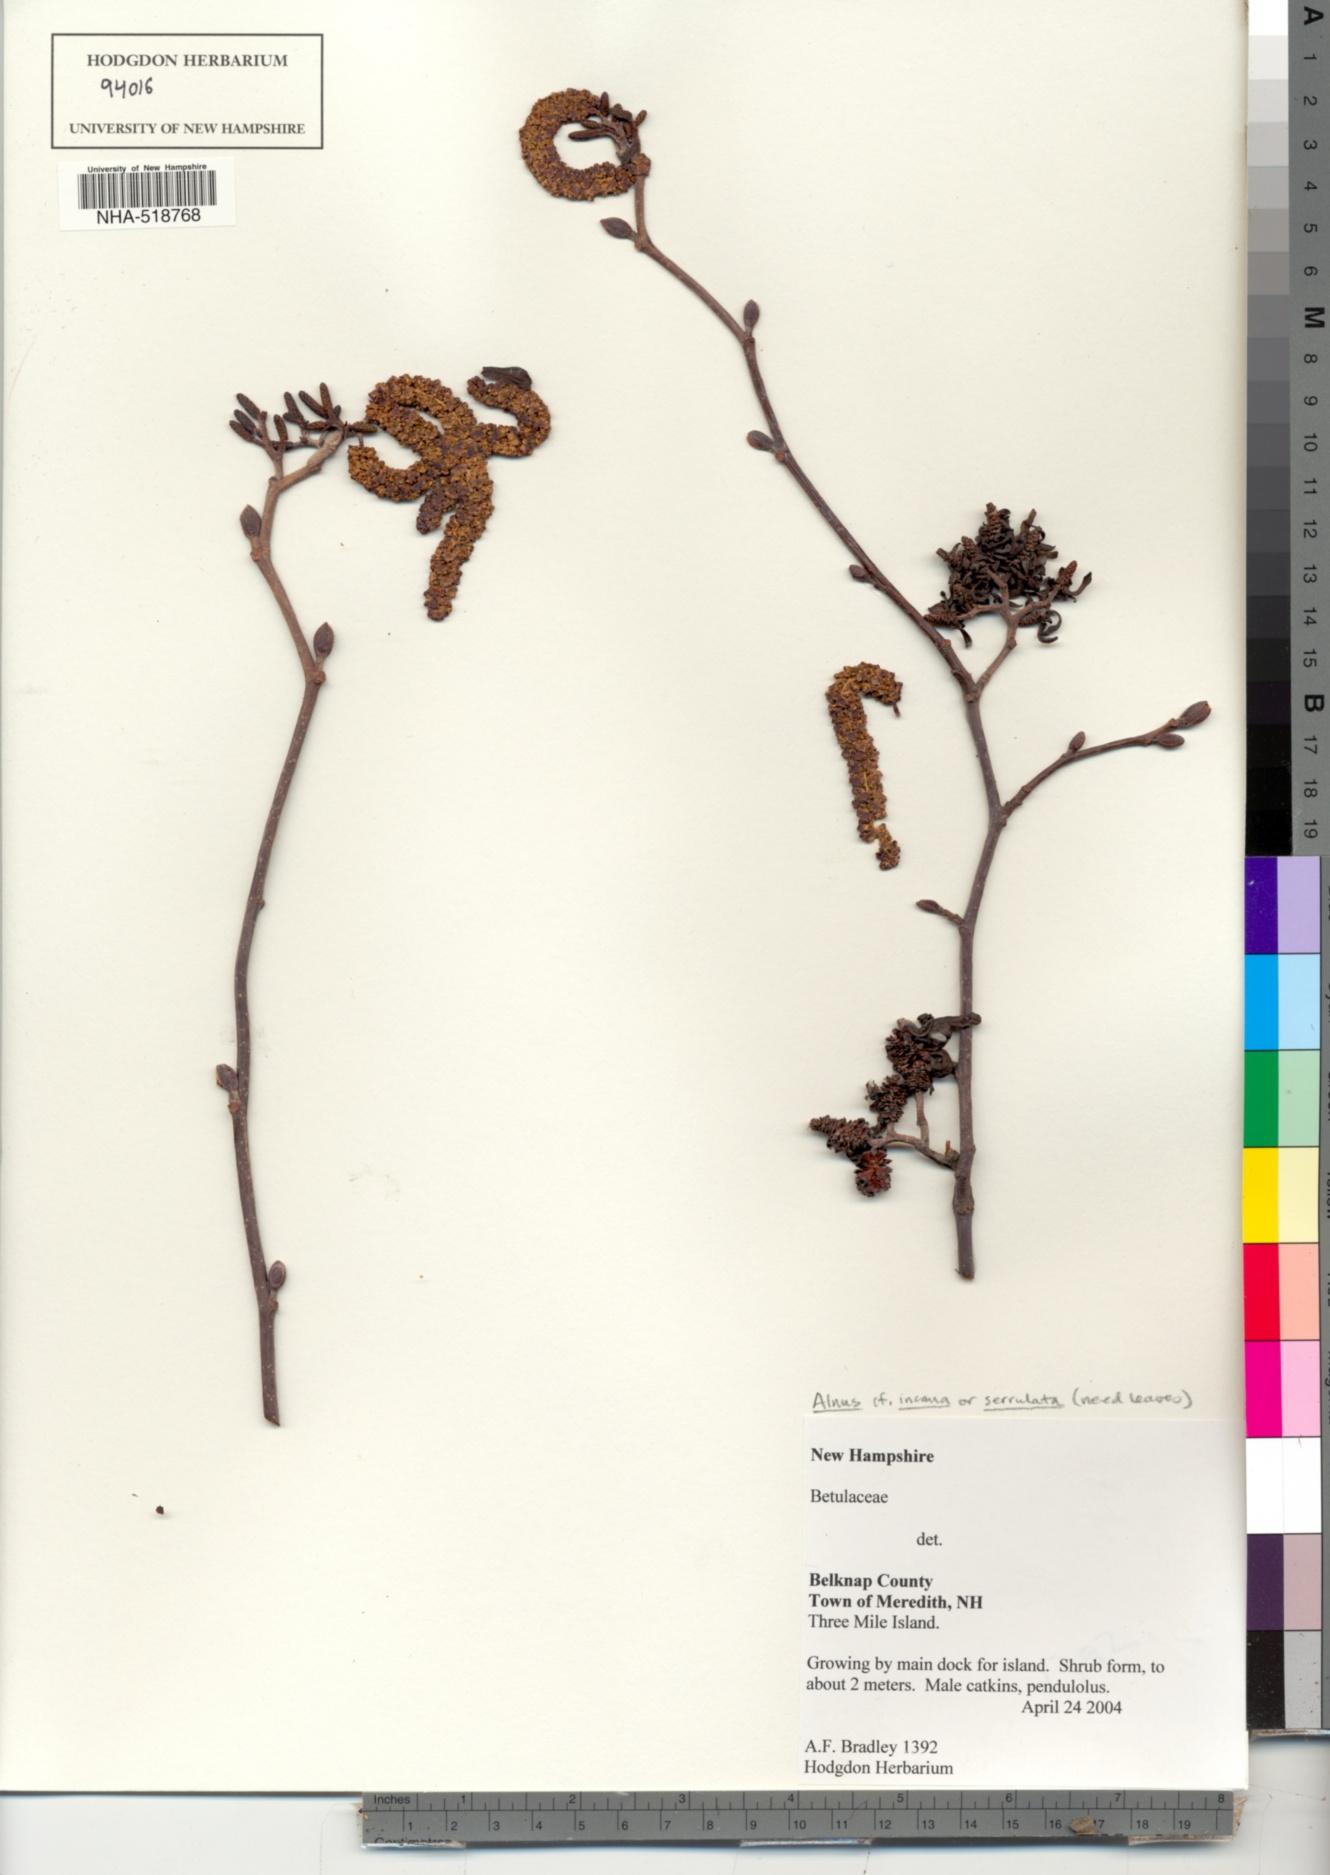 Betulaceae image